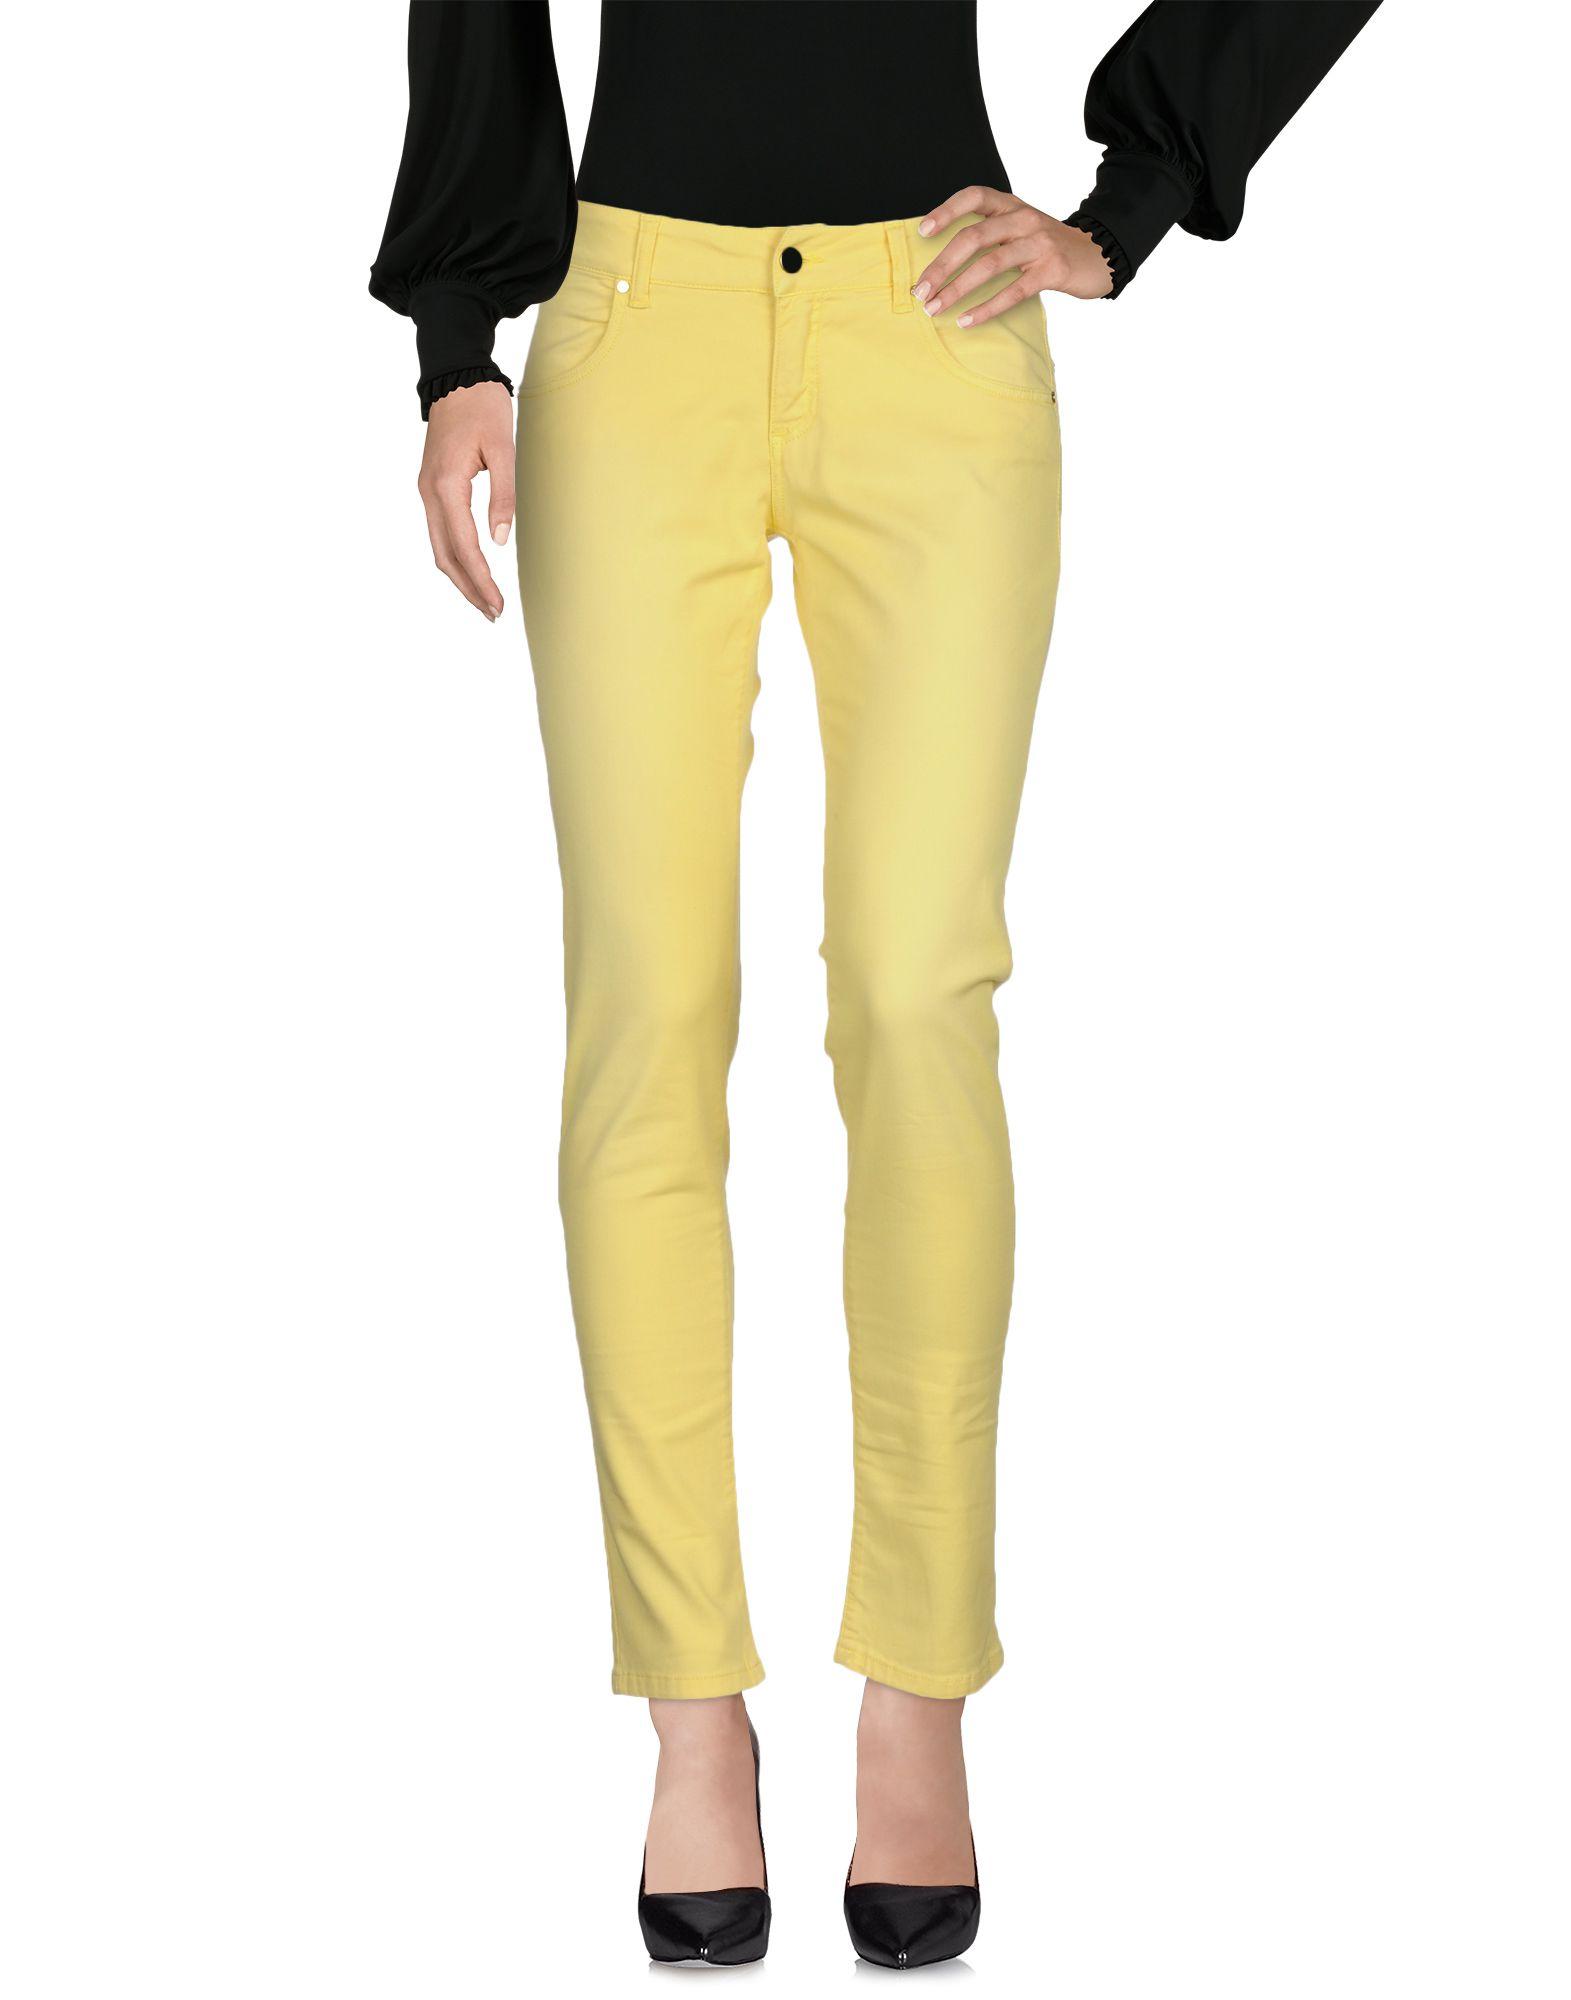 Pantalone Met donna donna donna - 42673682TJ 777